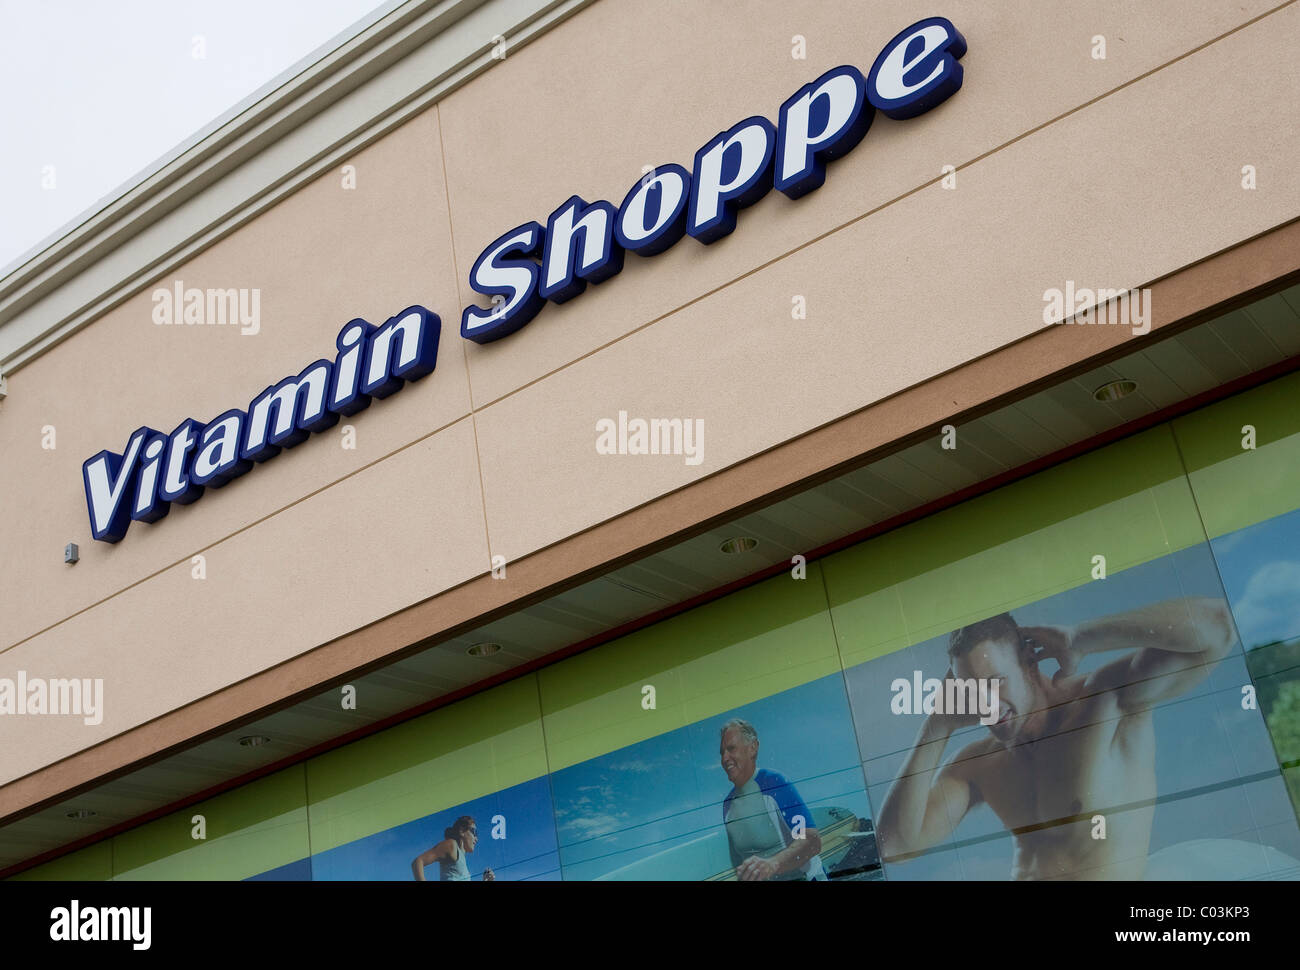 Una vitamina Shoppe tienda minorista. Imagen De Stock